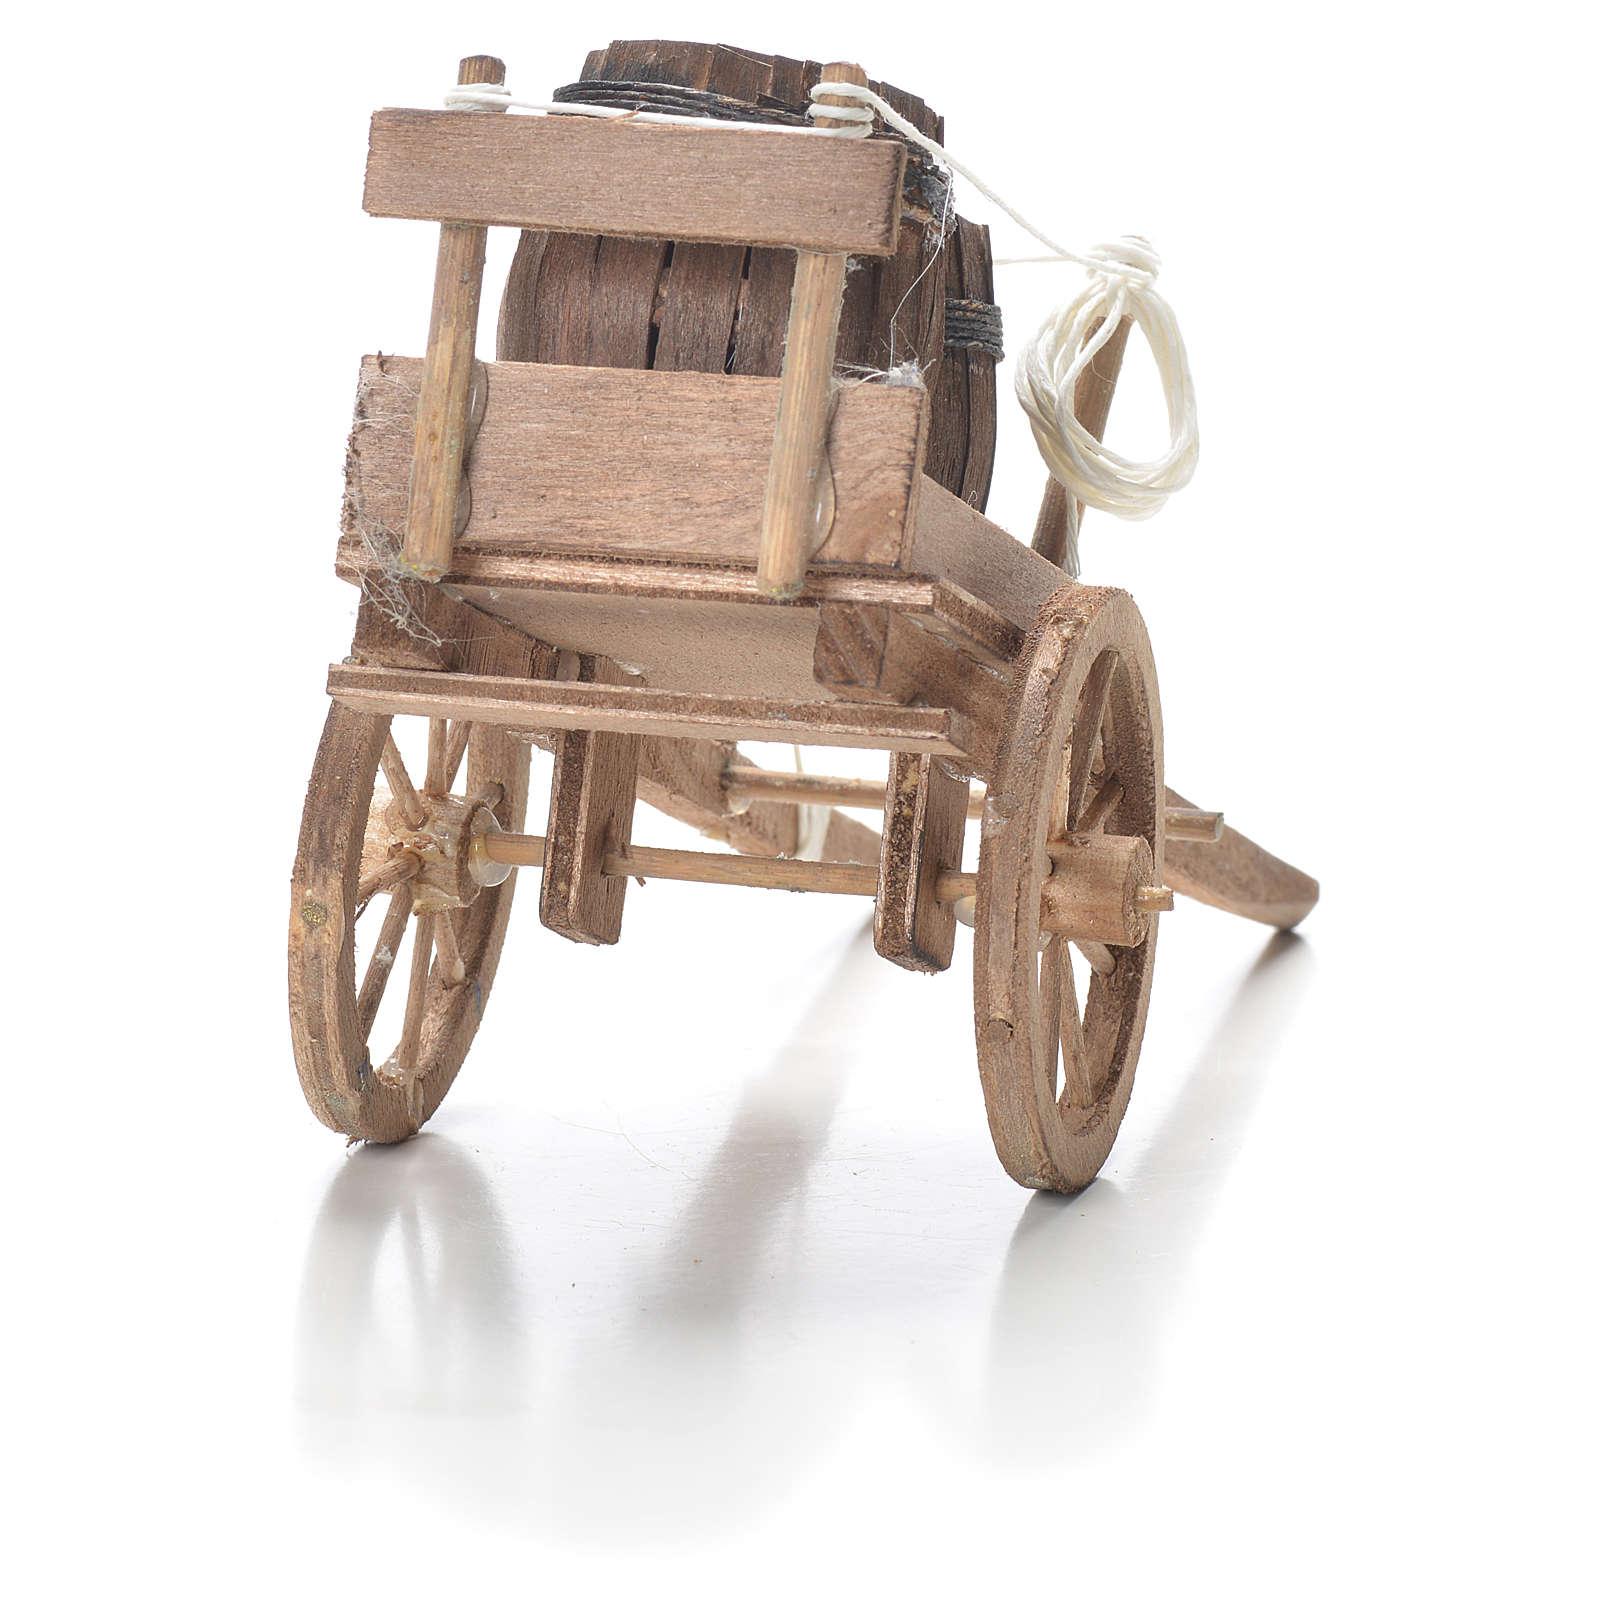 Carro con barriles belén Nápoles 10x18x8 cm 4